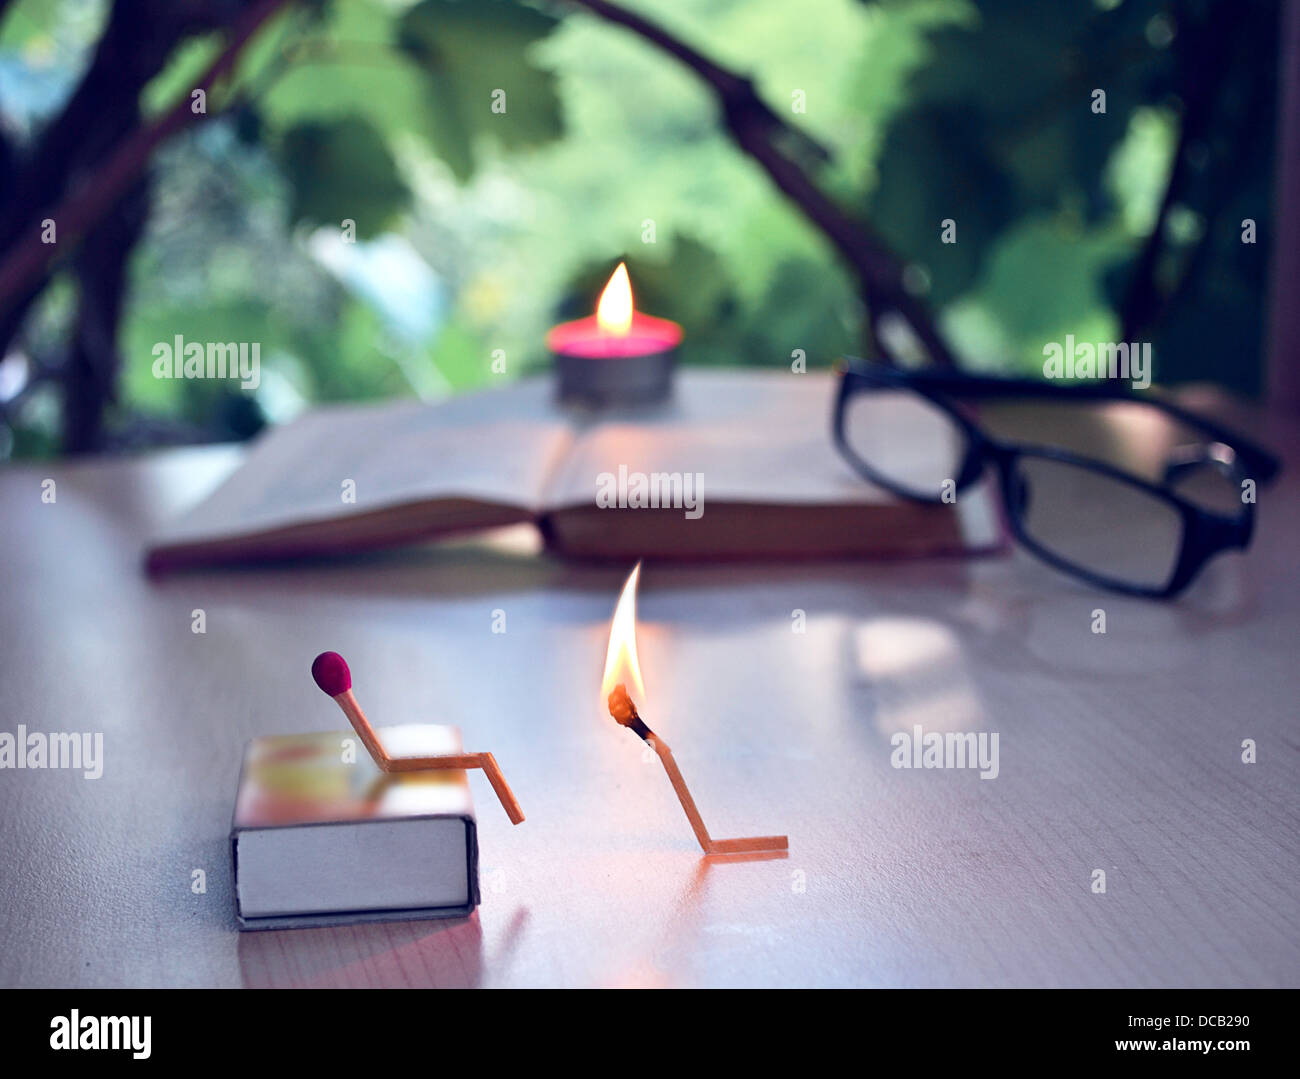 creative photo - Stock Image